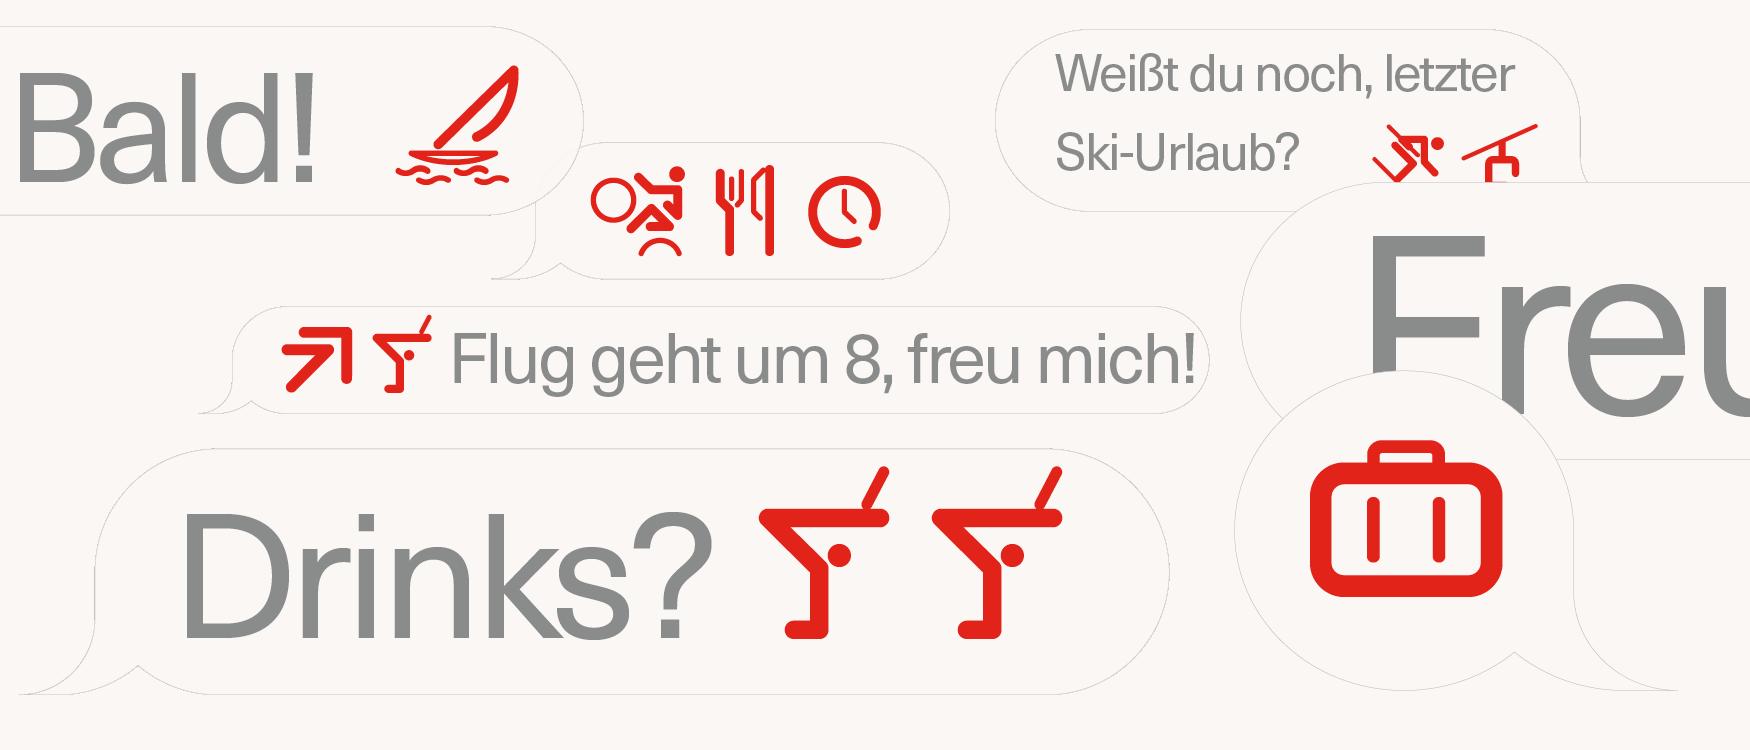 fonts_fonts-for-apps_messaging-apps_german